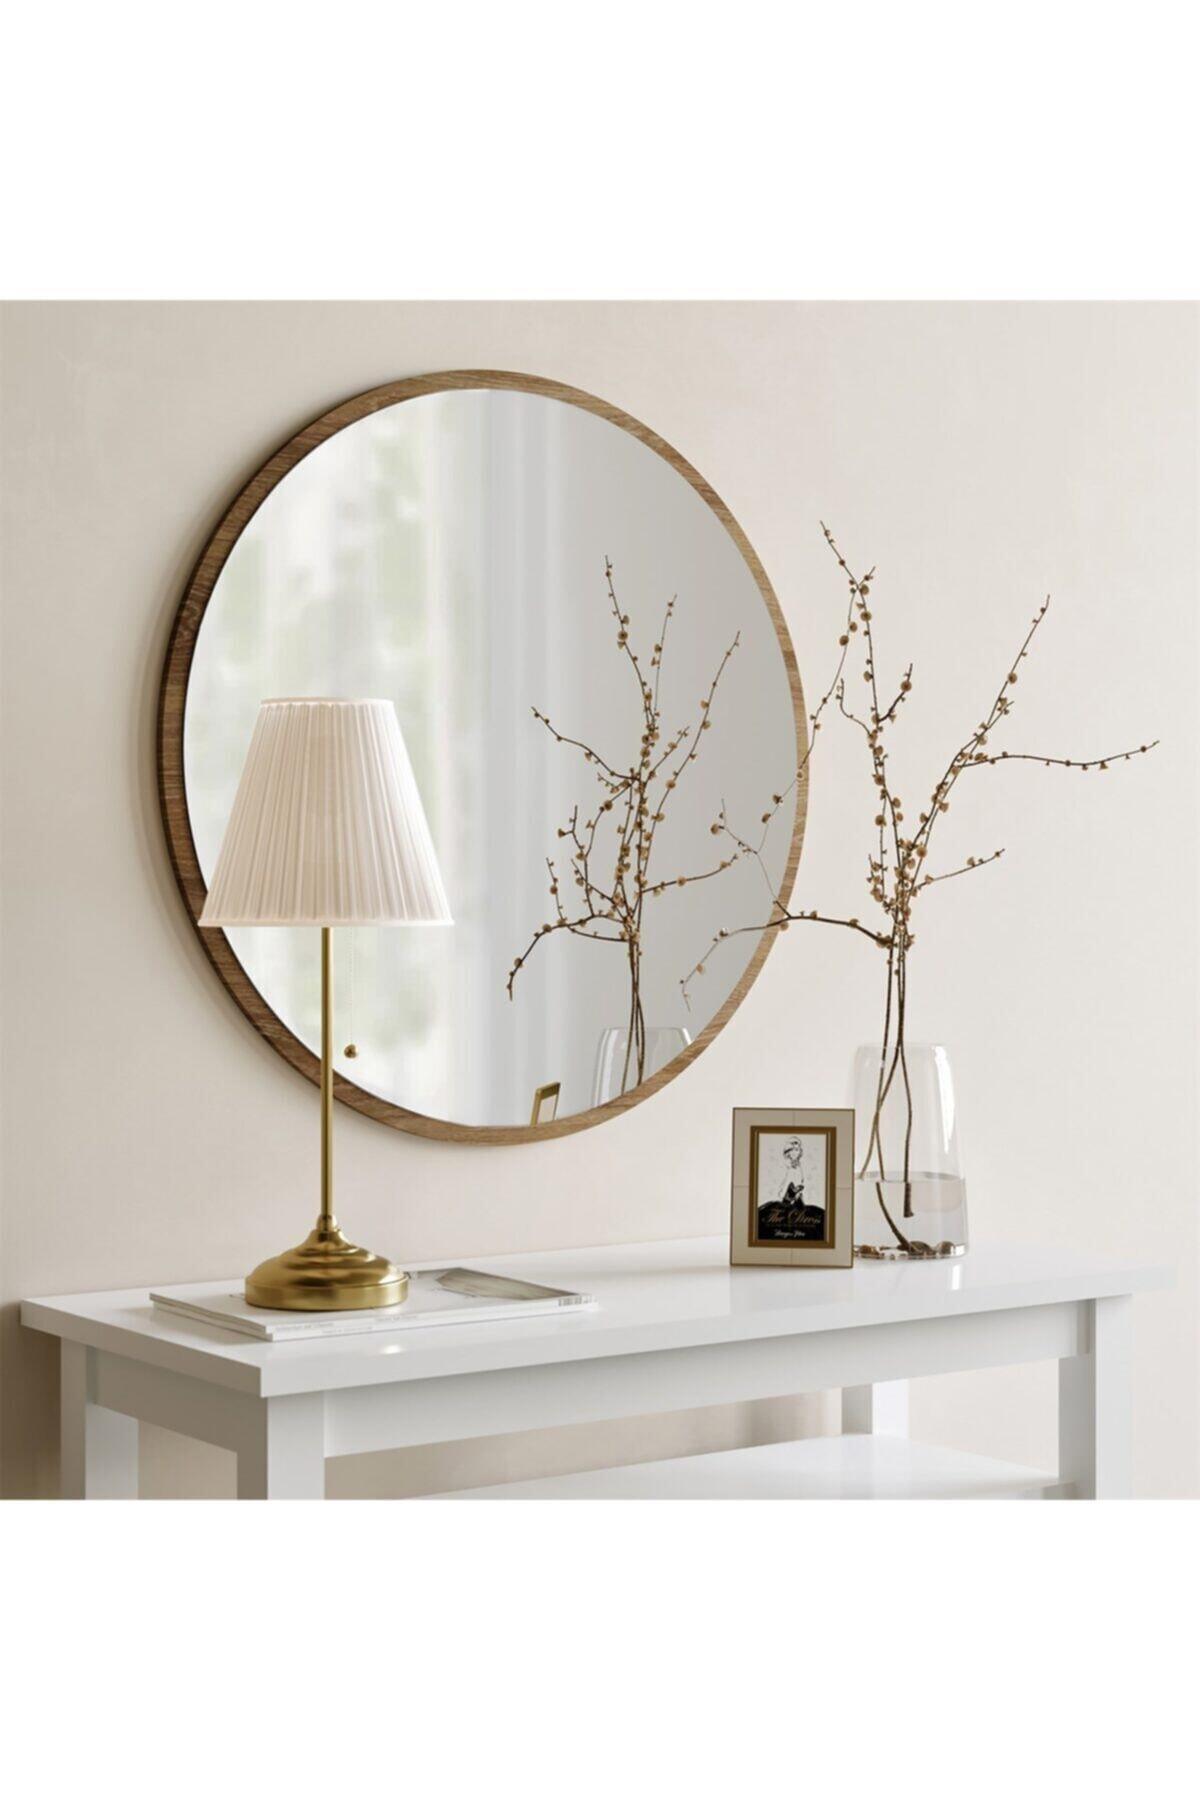 Tarz Design Yuvarlak Antre Hol Koridor Duvar Salon Mutfak Banyo Ofis Aynası 45 Cm